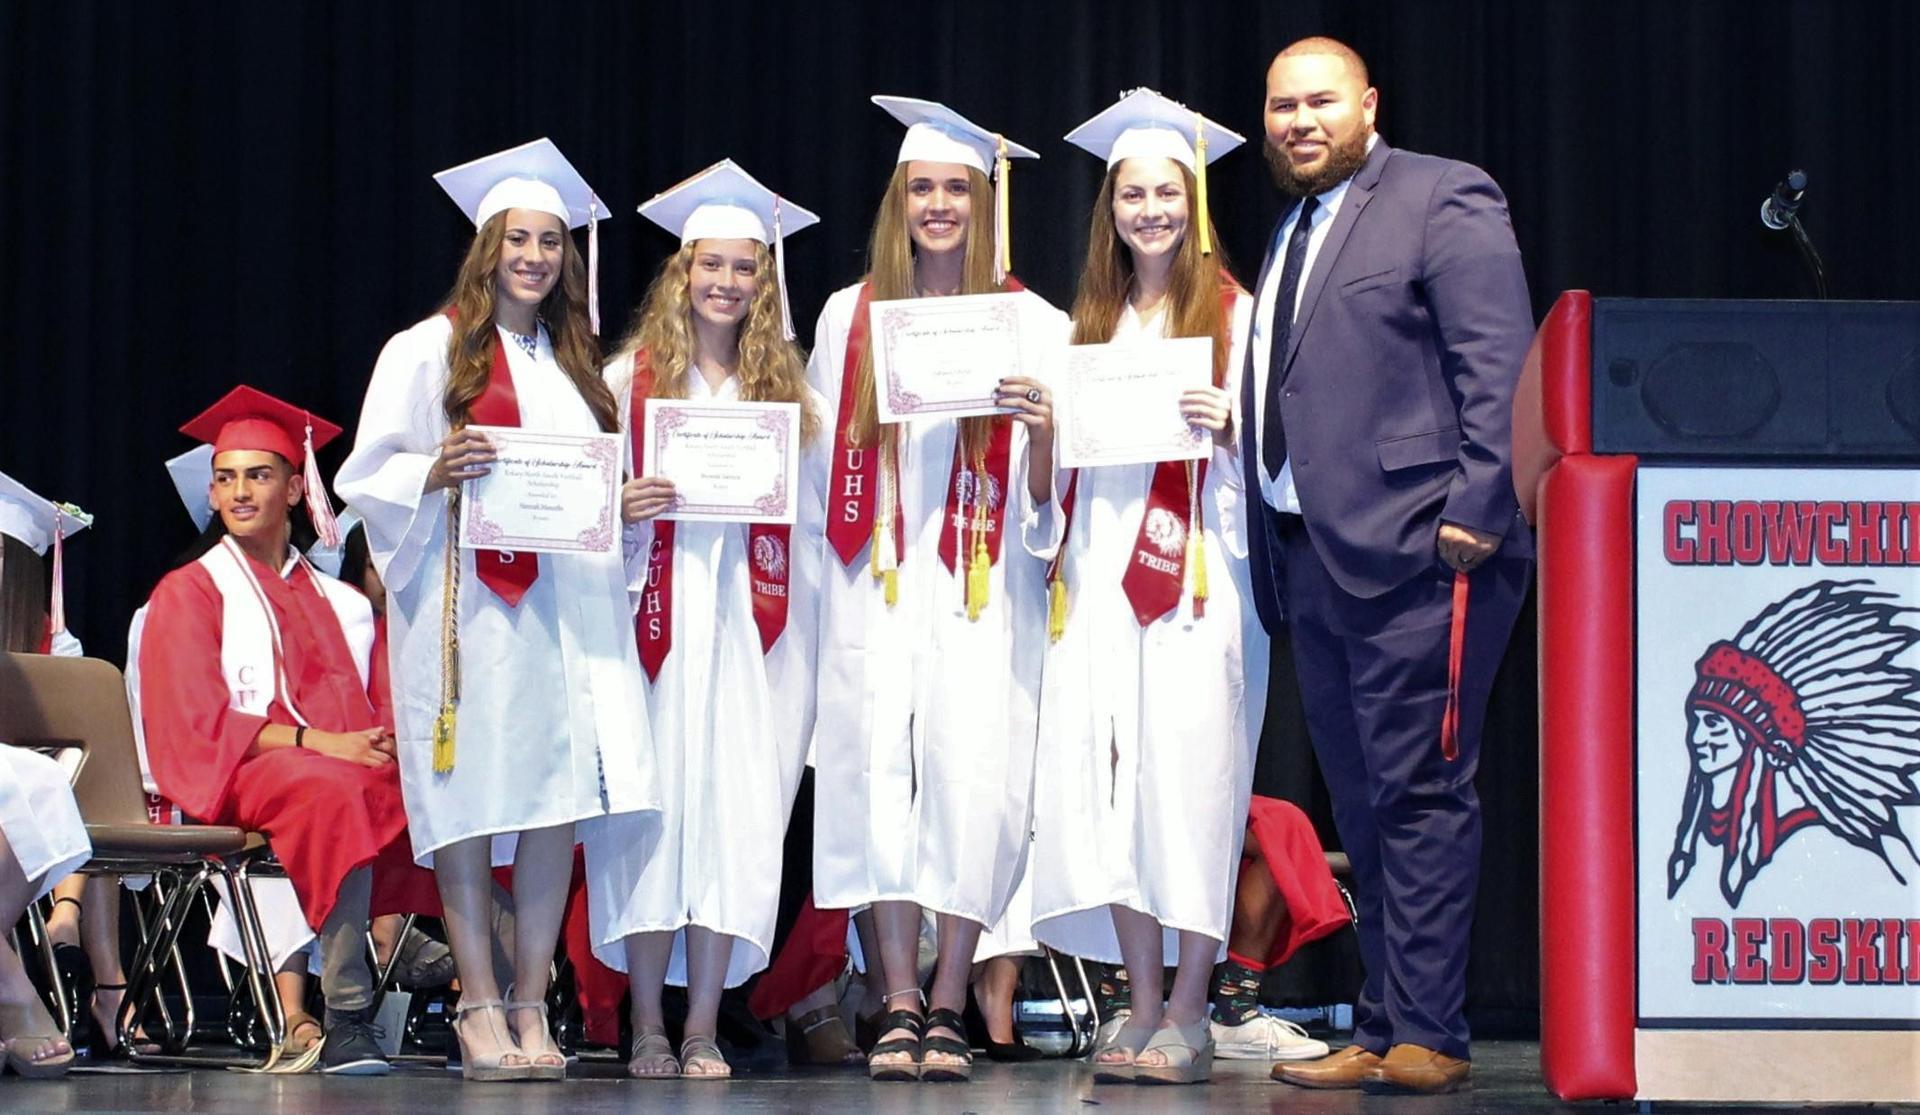 Hannah Mancebo, Miranda Valencia, Adriana Felsinger, Emily Seals, CUHS Athletic Director Jordan Murphy